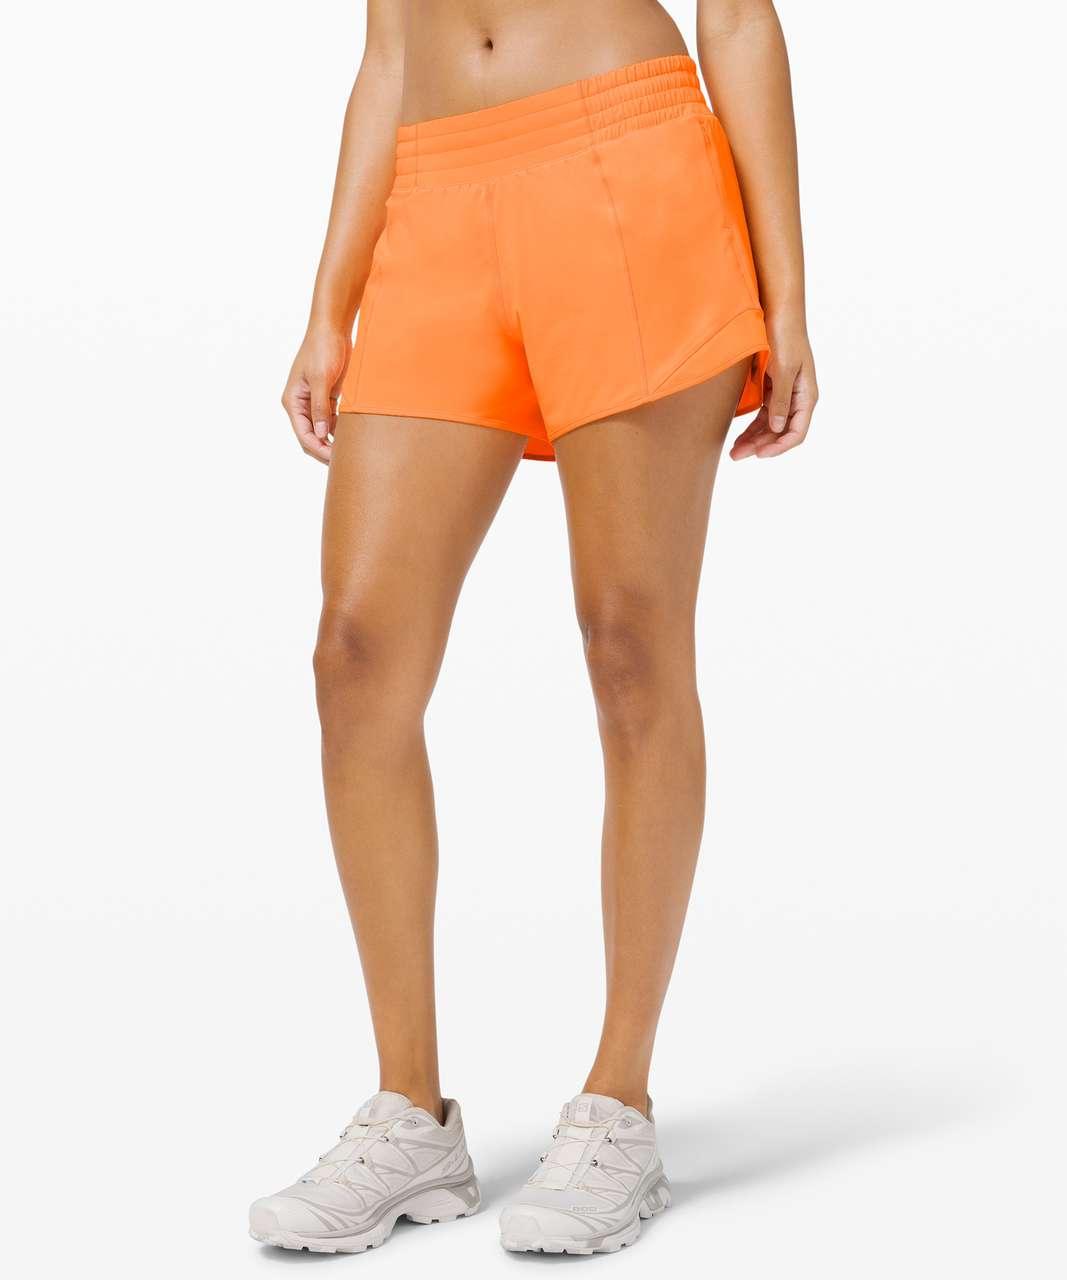 "Lululemon Hotty Hot Short *High-Rise Long 4"" - Highlight Orange"